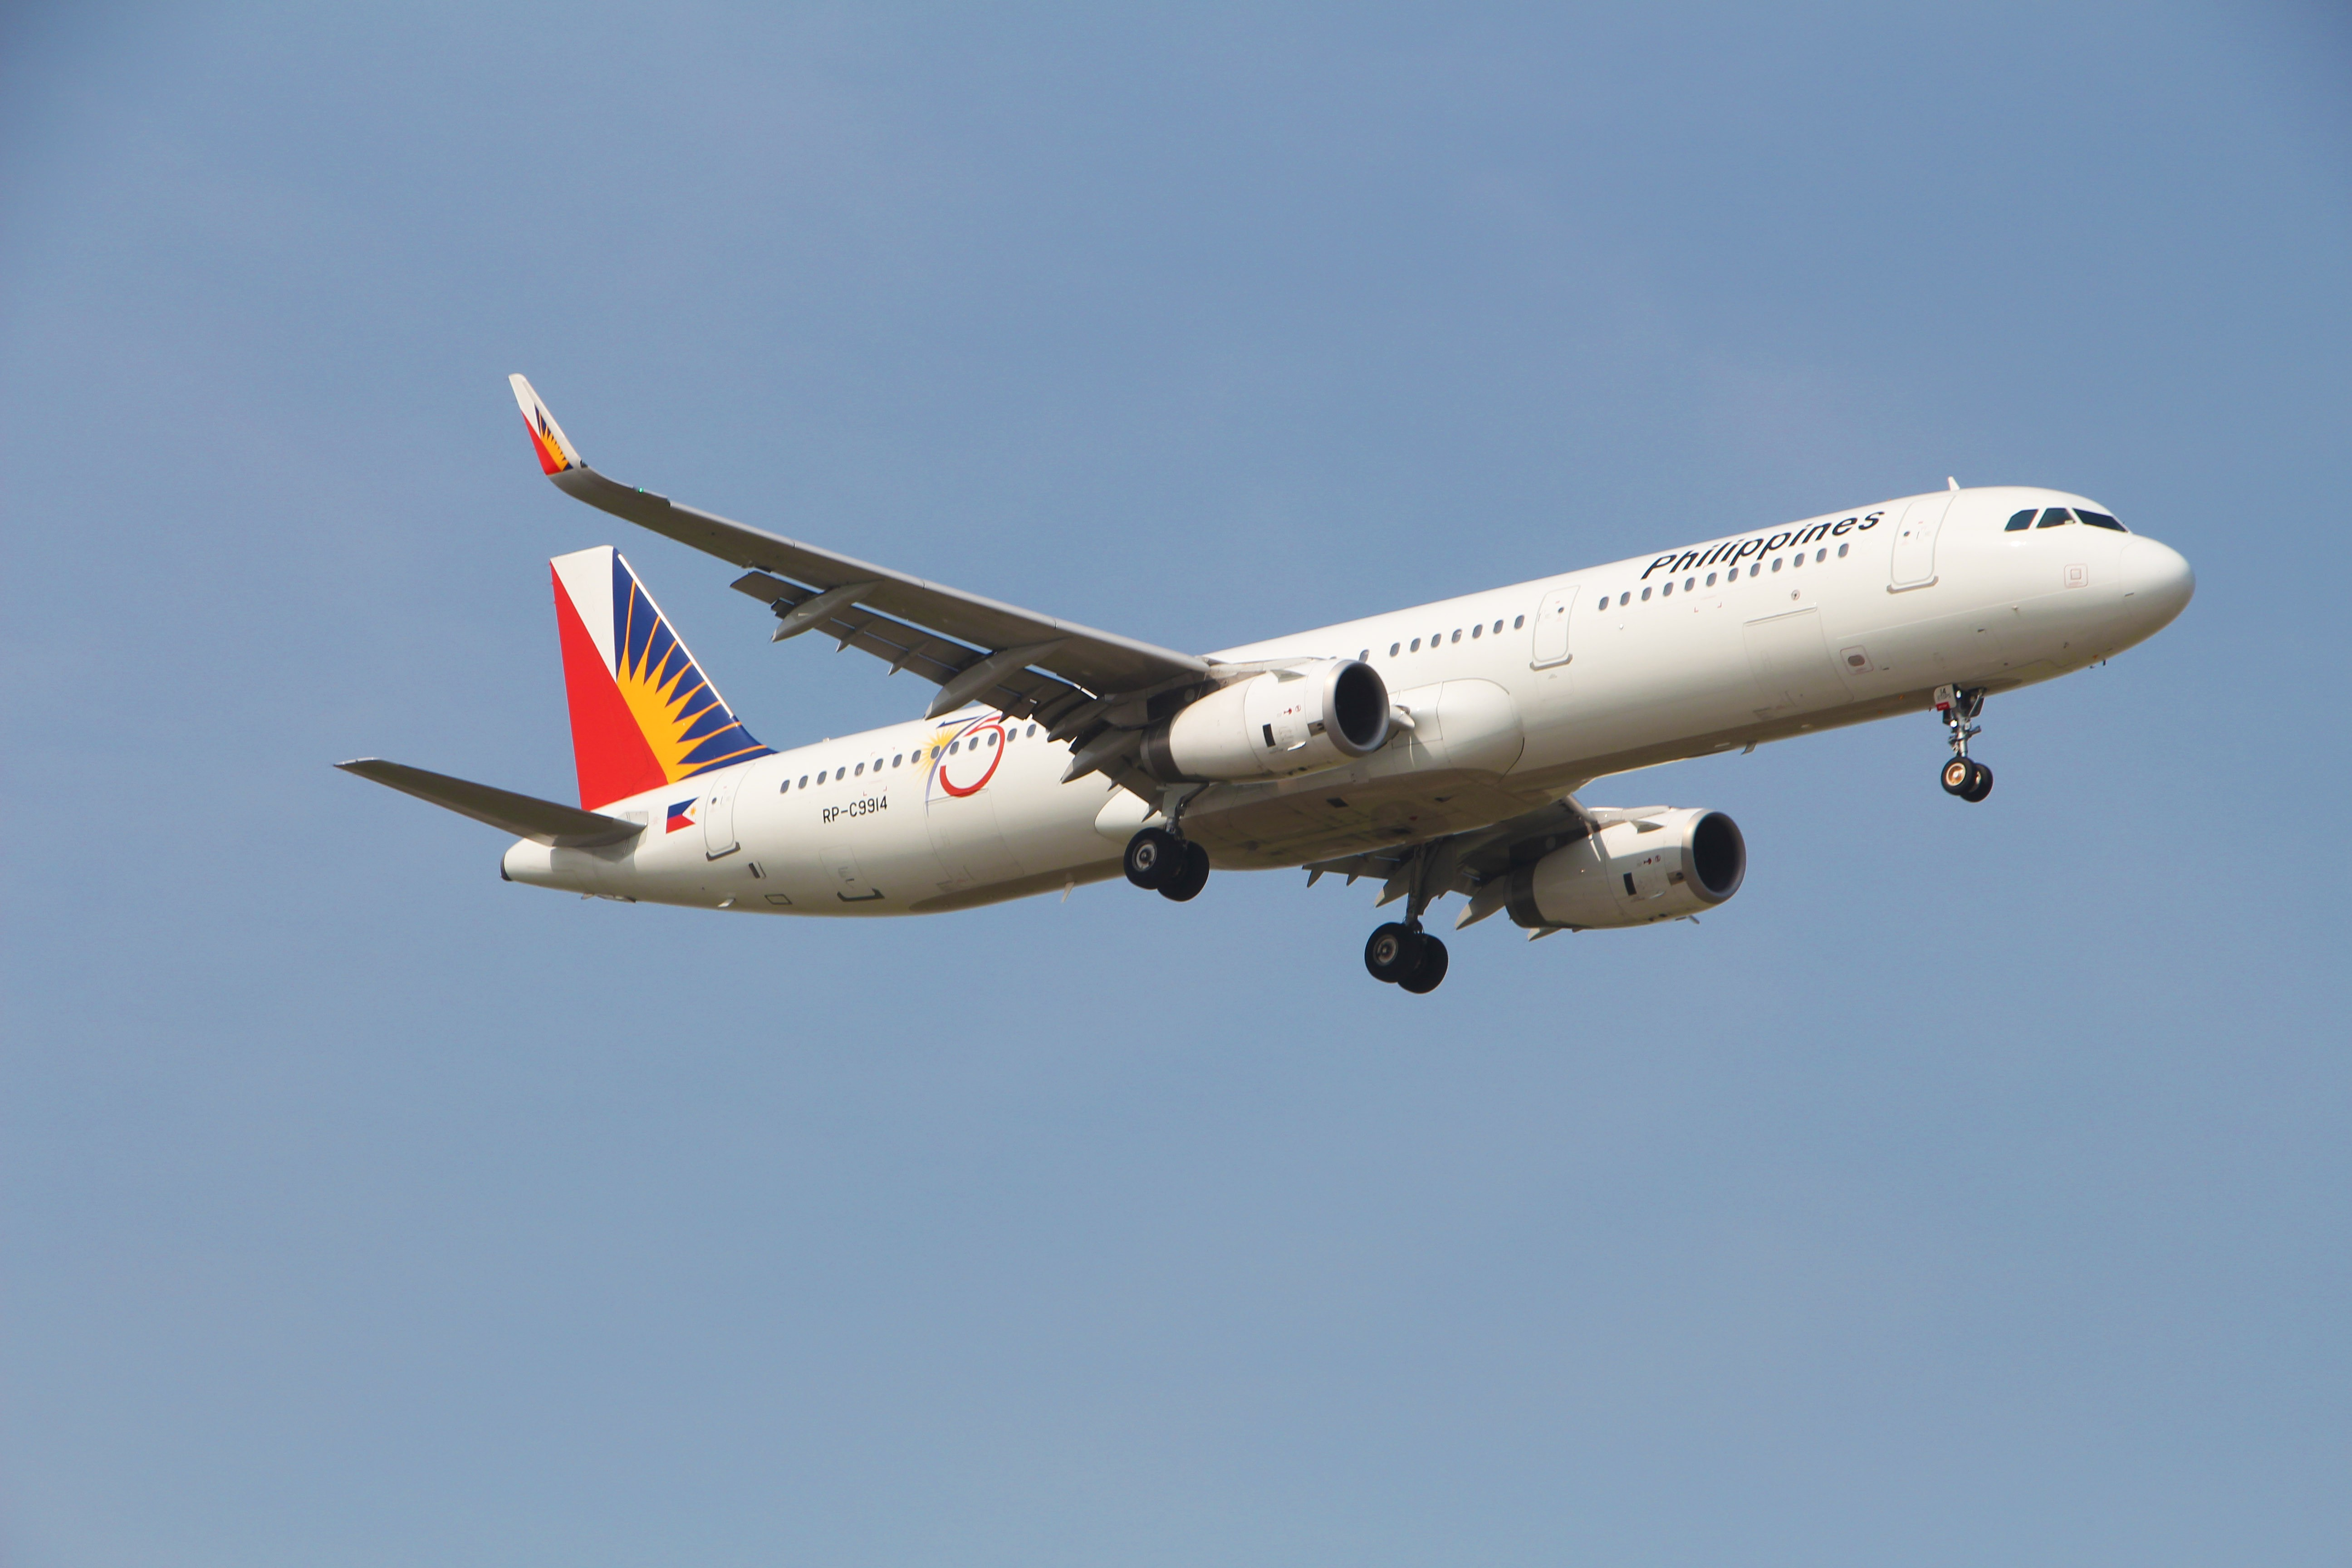 Re:[原创]浦东拍机大作战 AIRBUS A321 RP-C9914 中国上海浦东国际机场